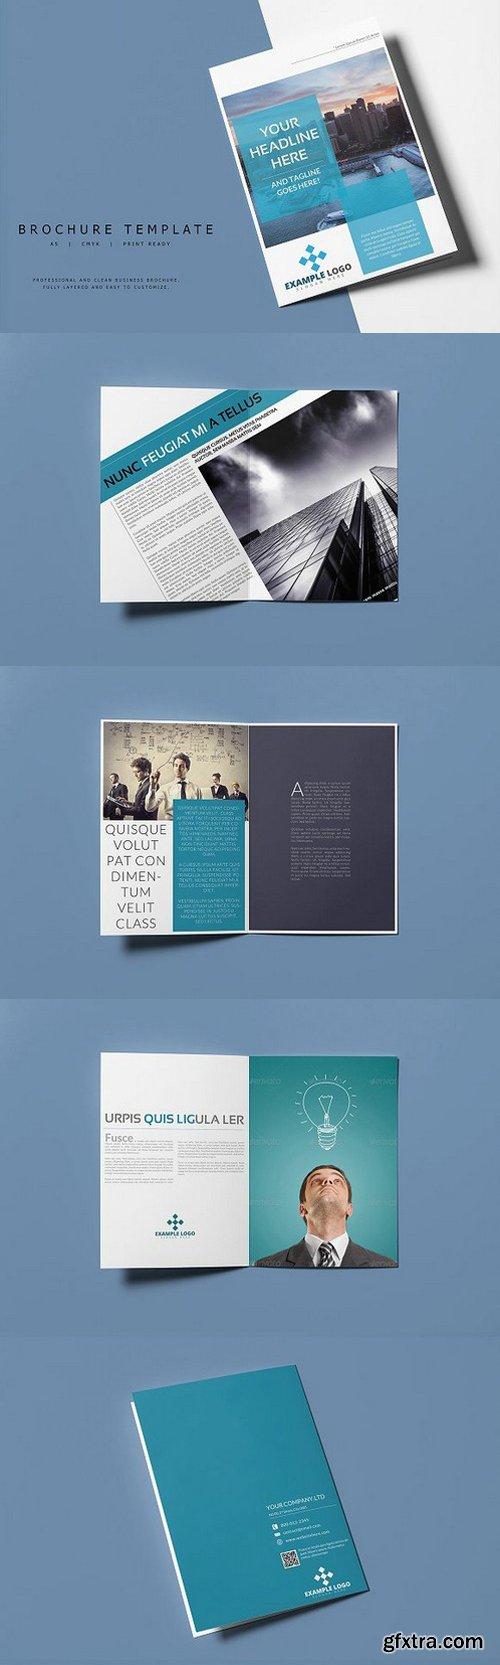 Brochure Template 14